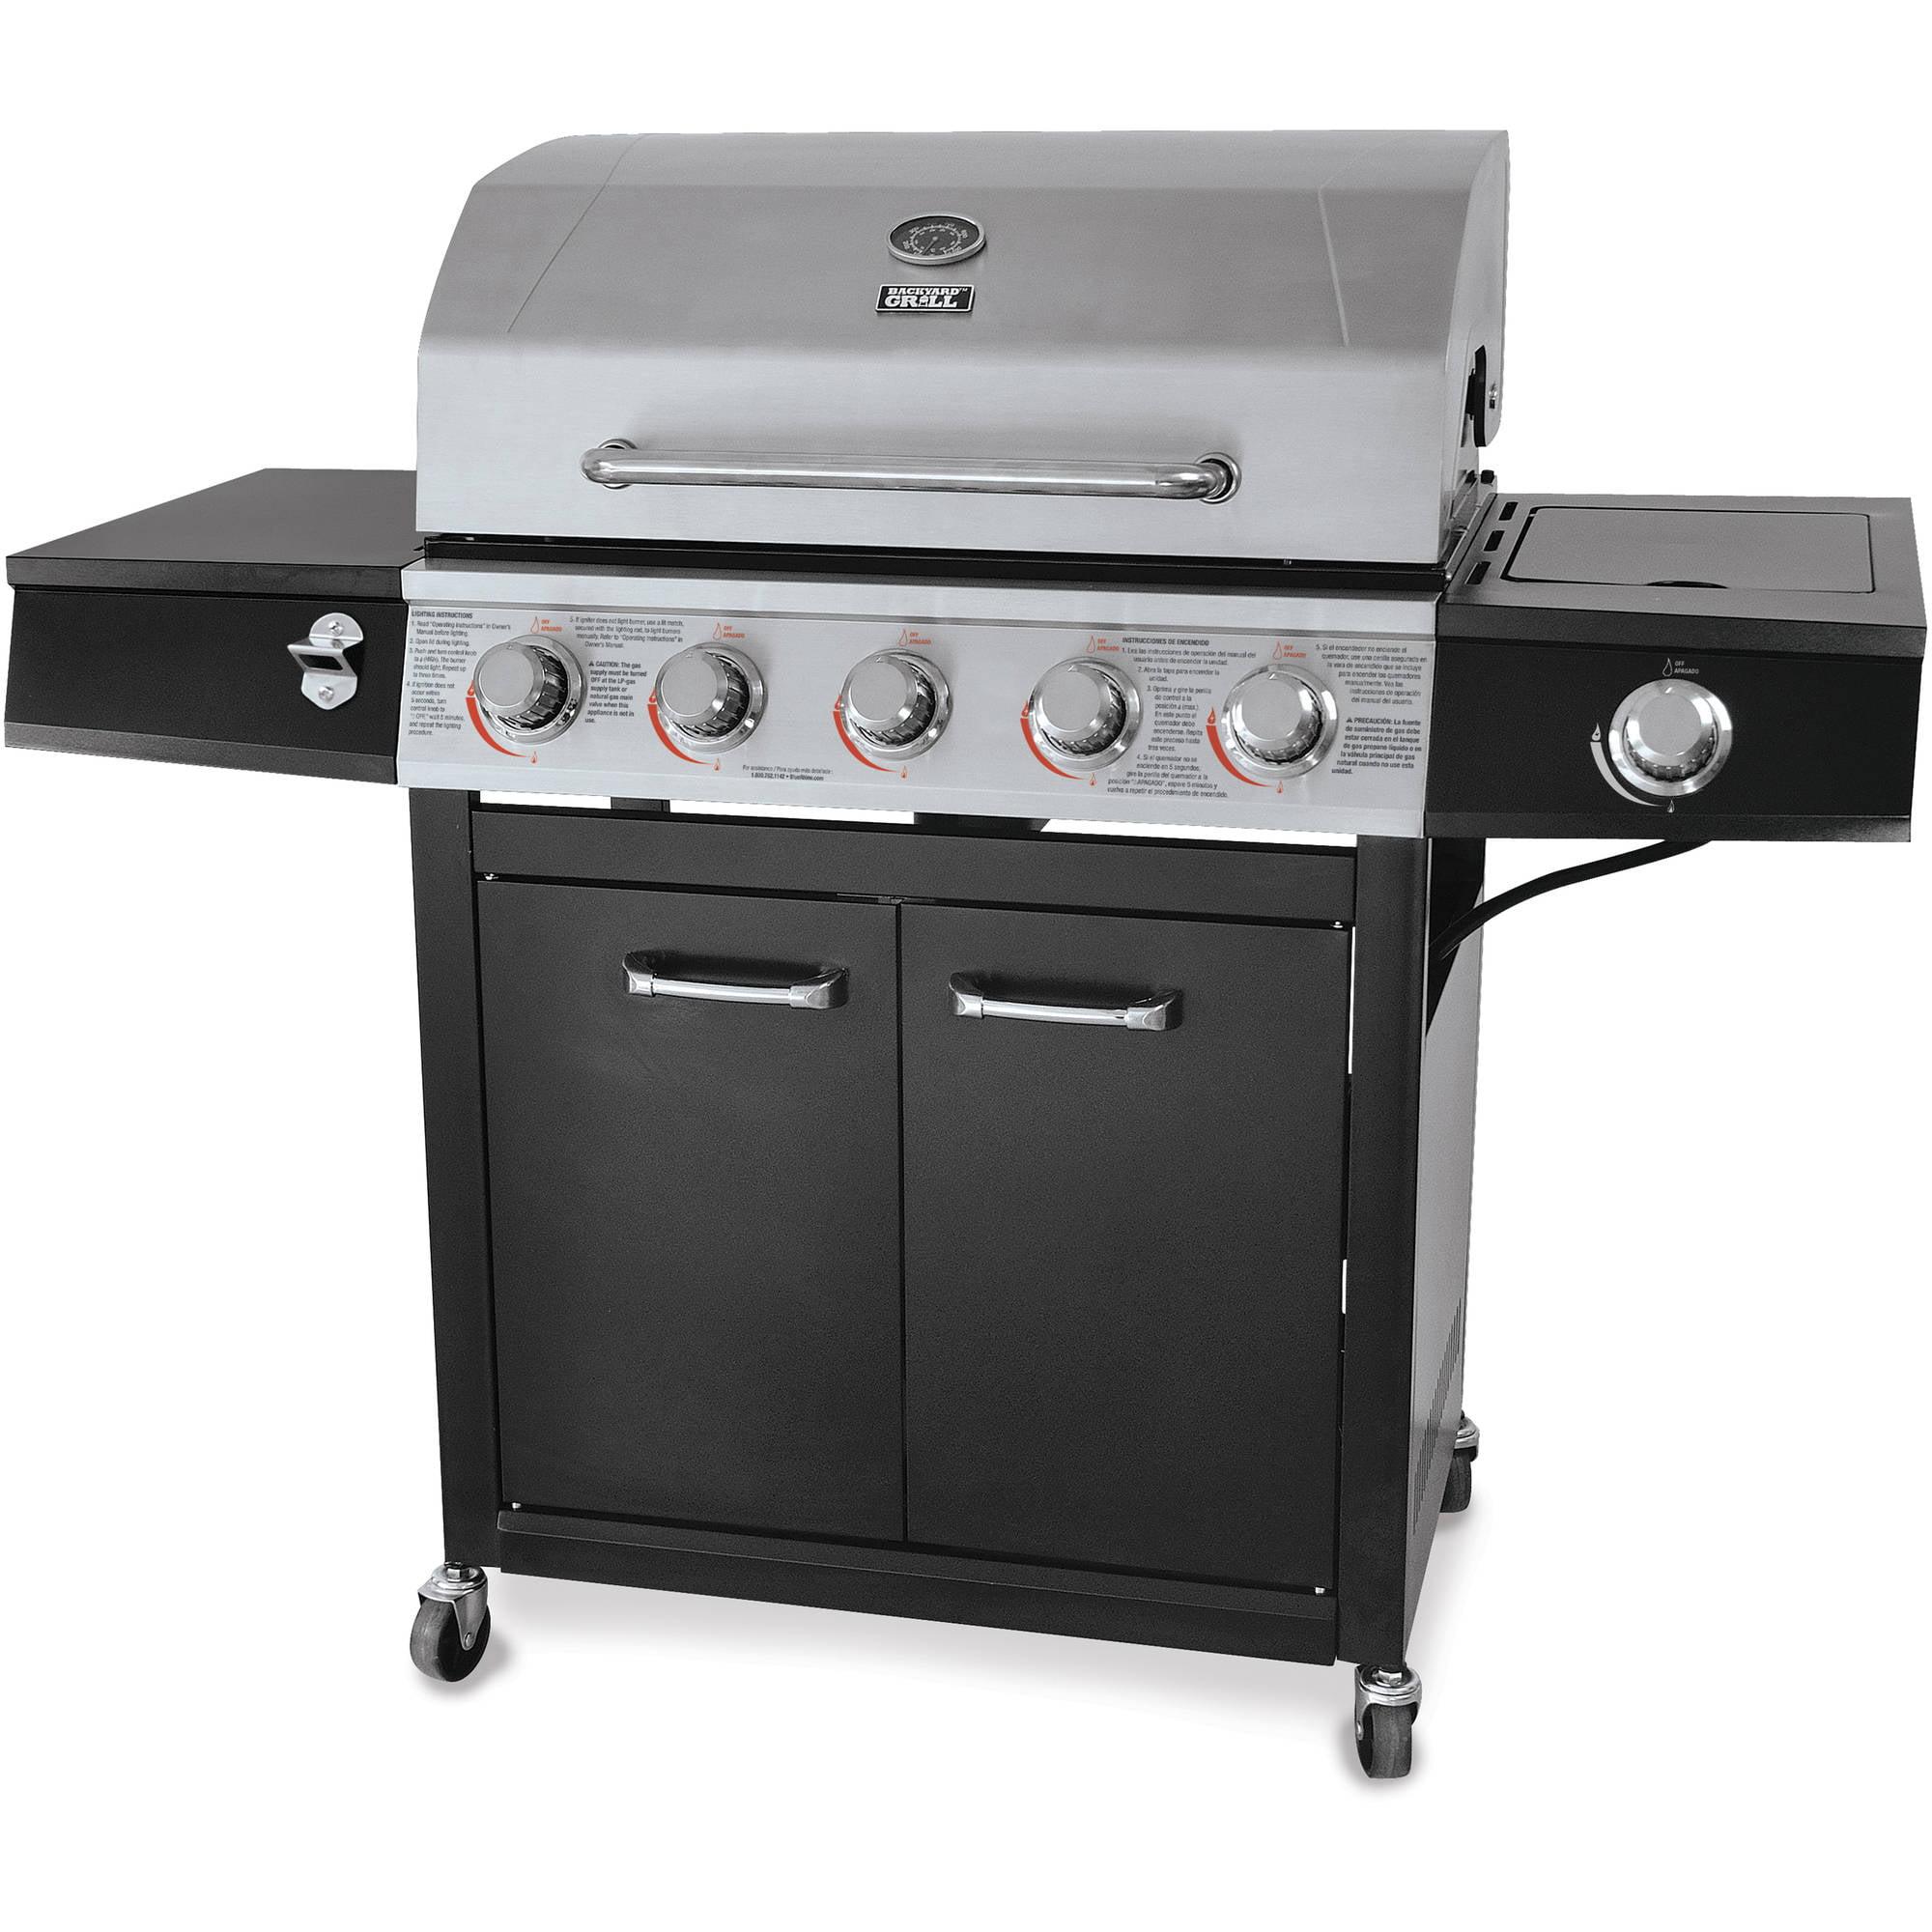 backyard grill 72 000 btu 5 burner gas grill stainless steel